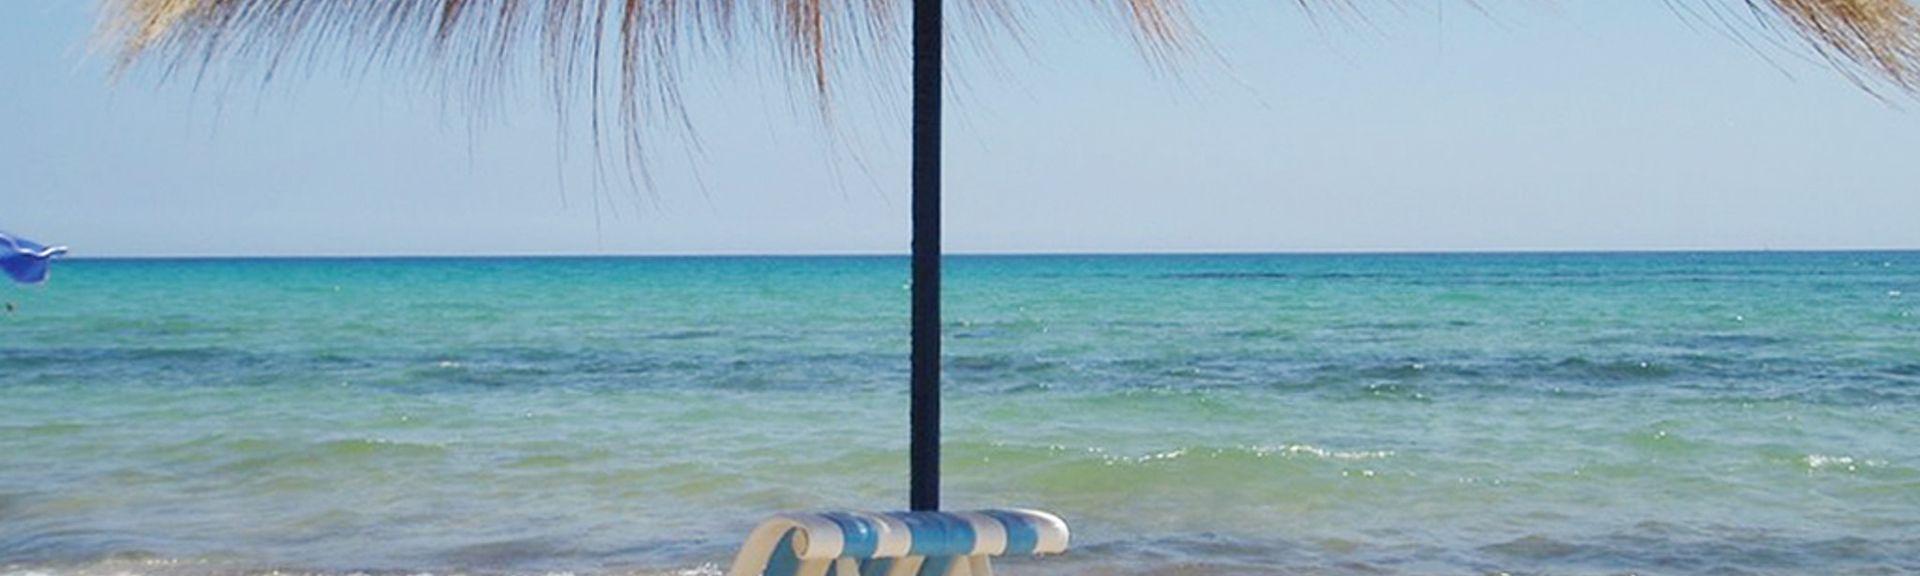 Port Yasmine, Hammamet, Tunisia